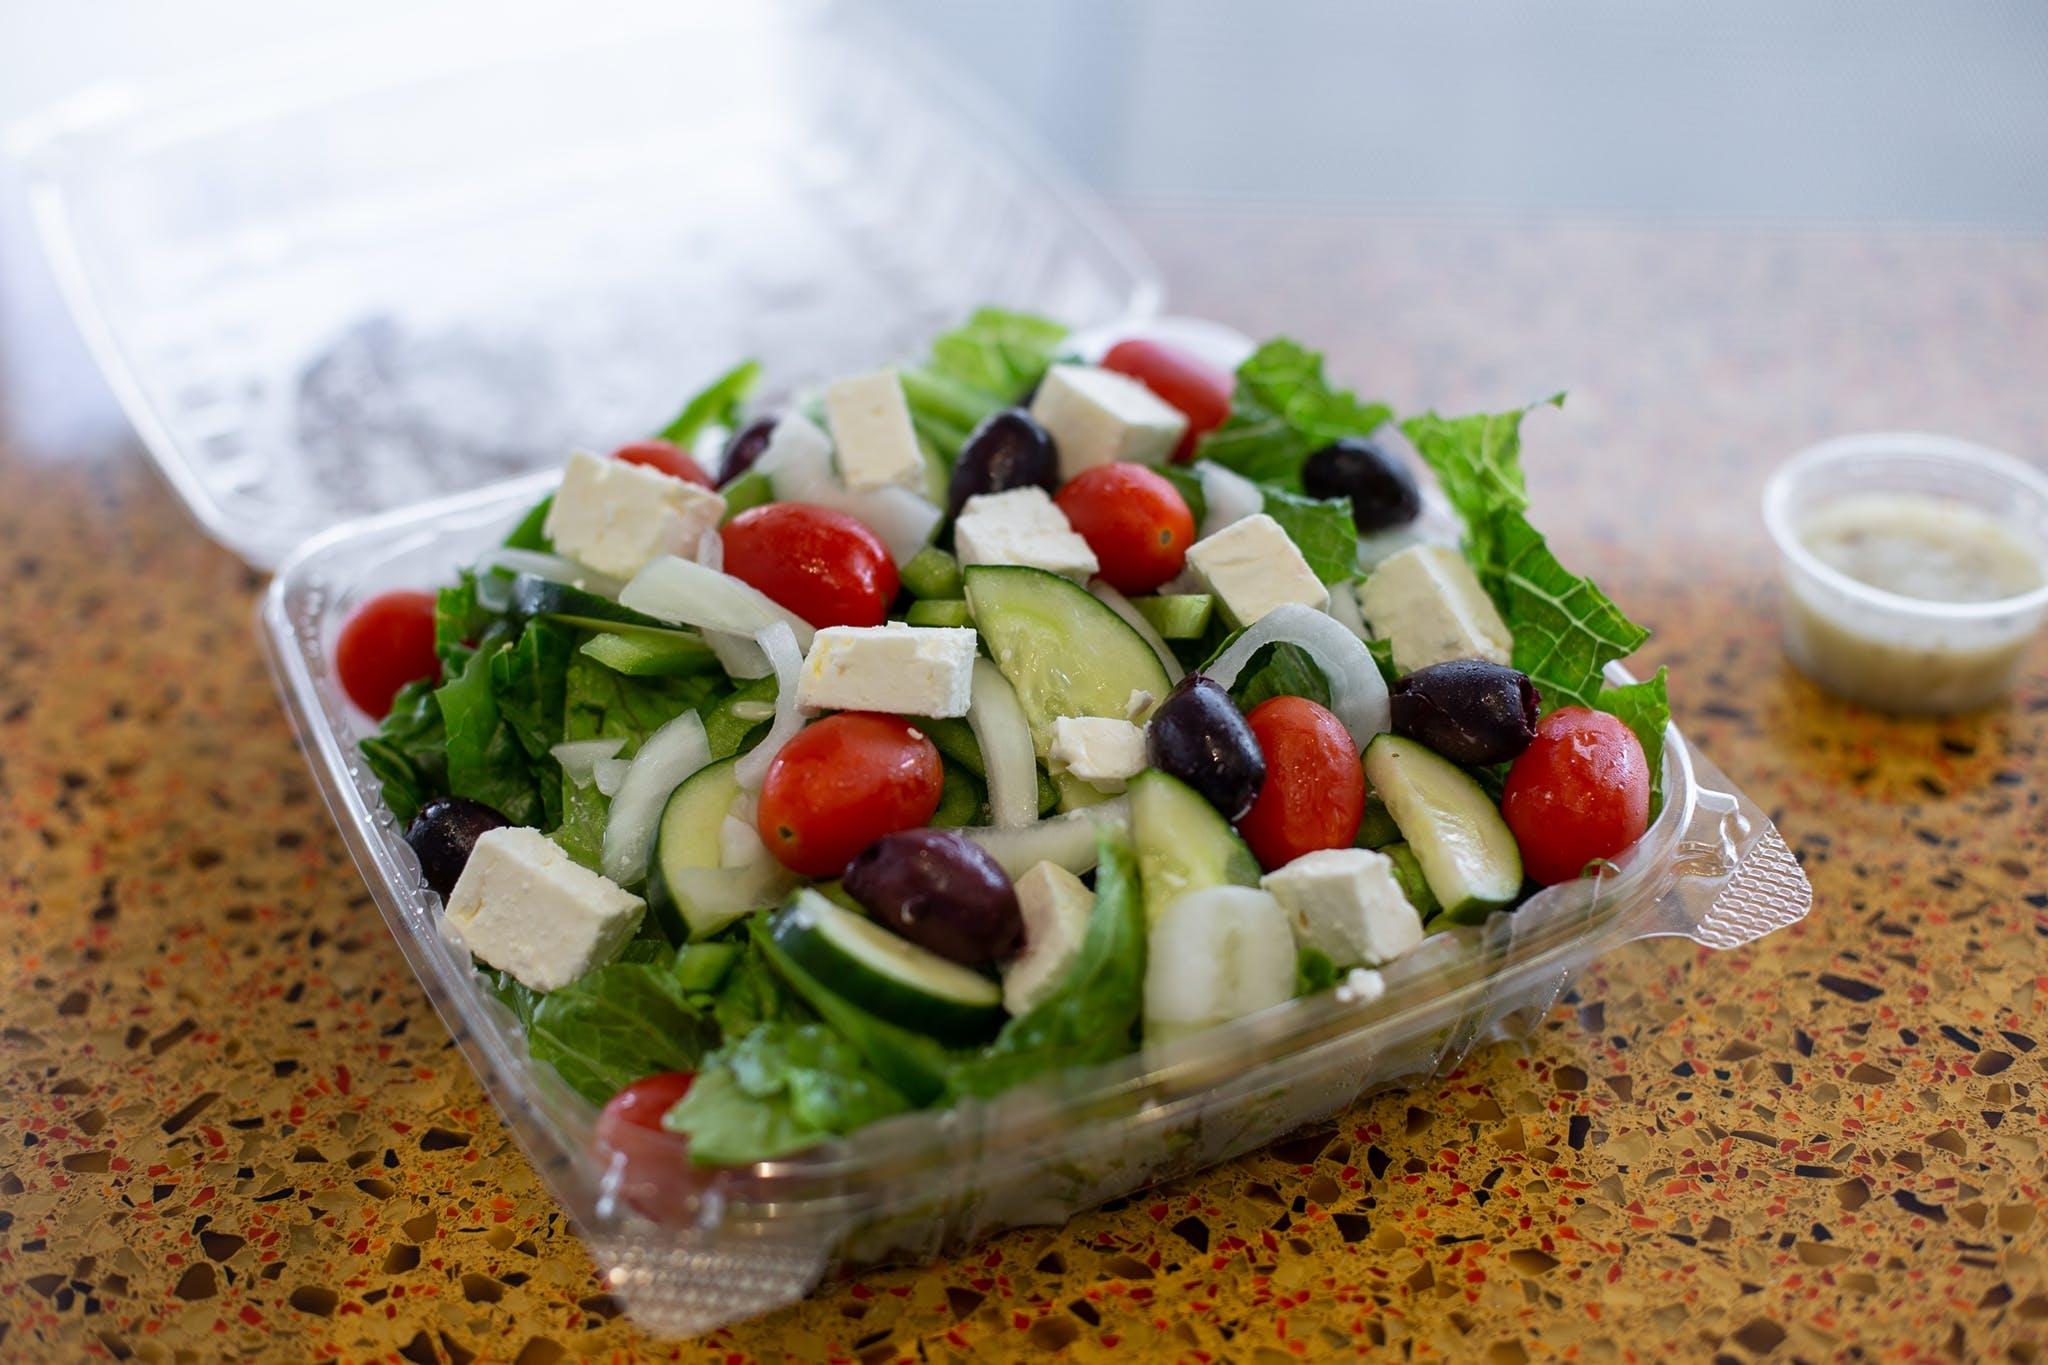 Greek Salad from Sarpino's Pizza in Lawrence, KS